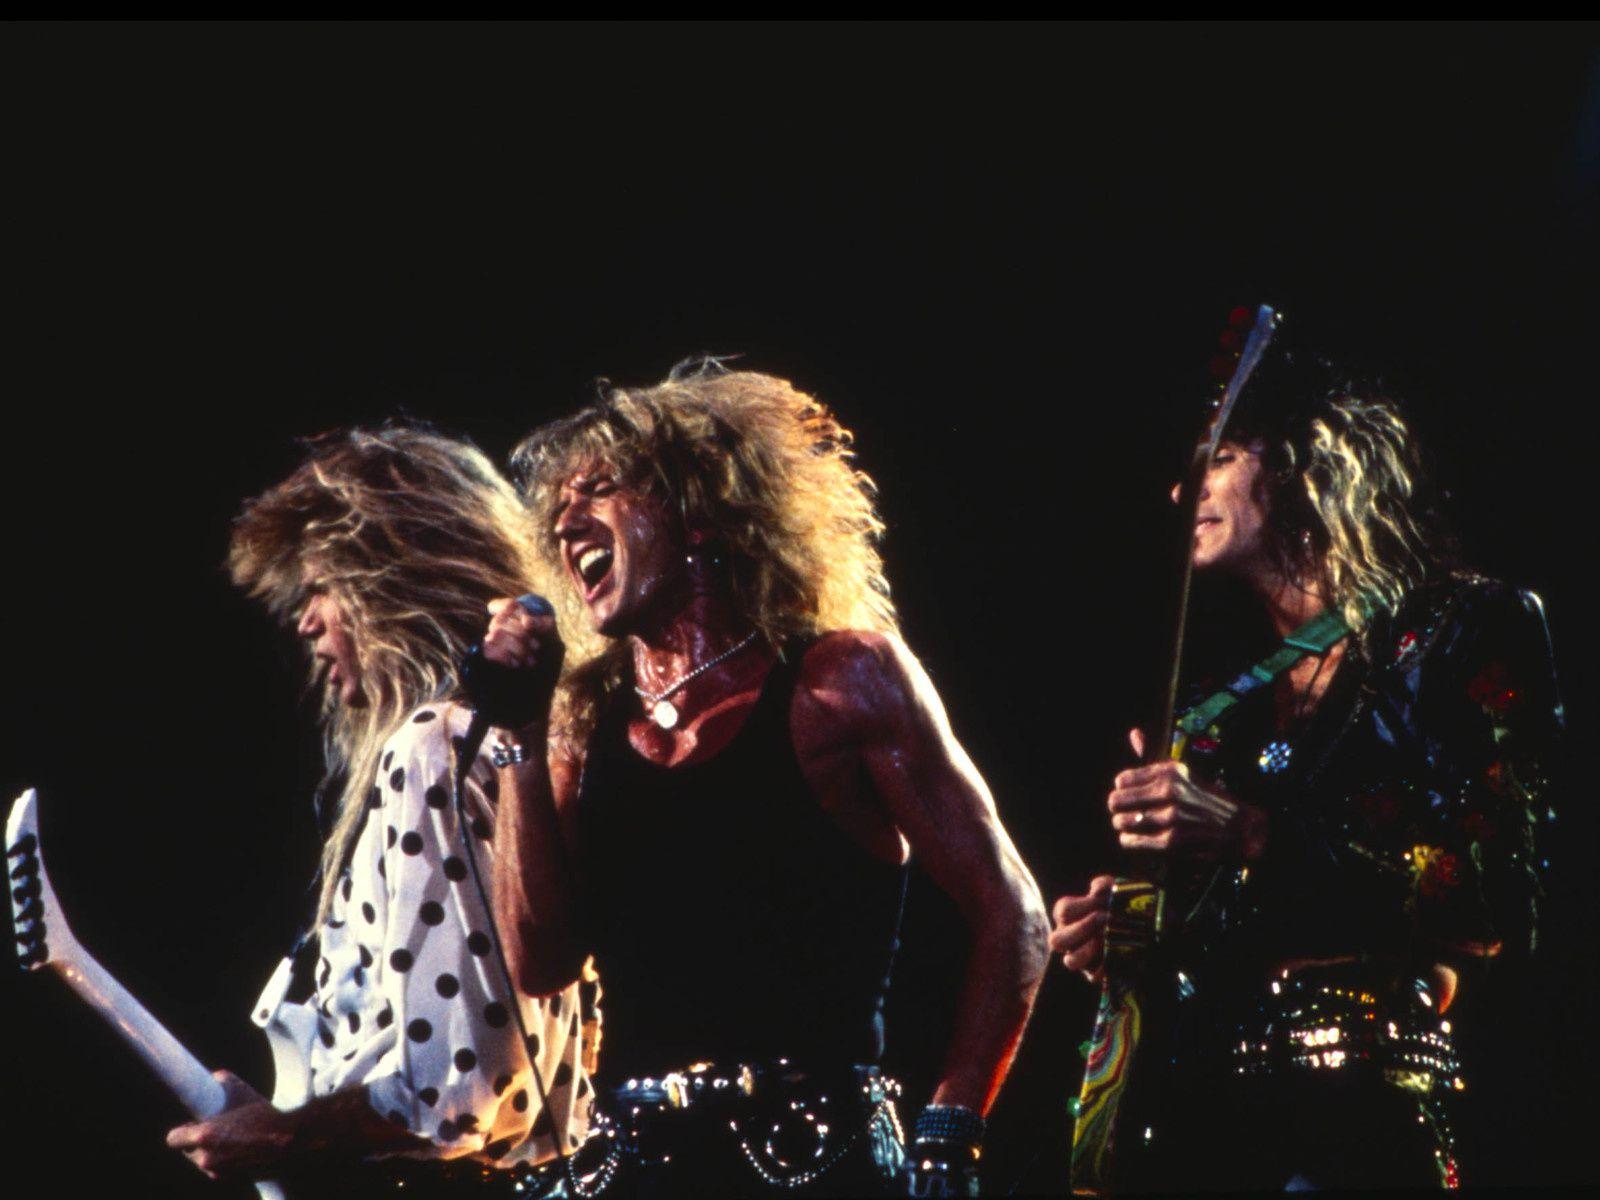 David Coverdale, Whitesnake - Live At Donnington (1990)